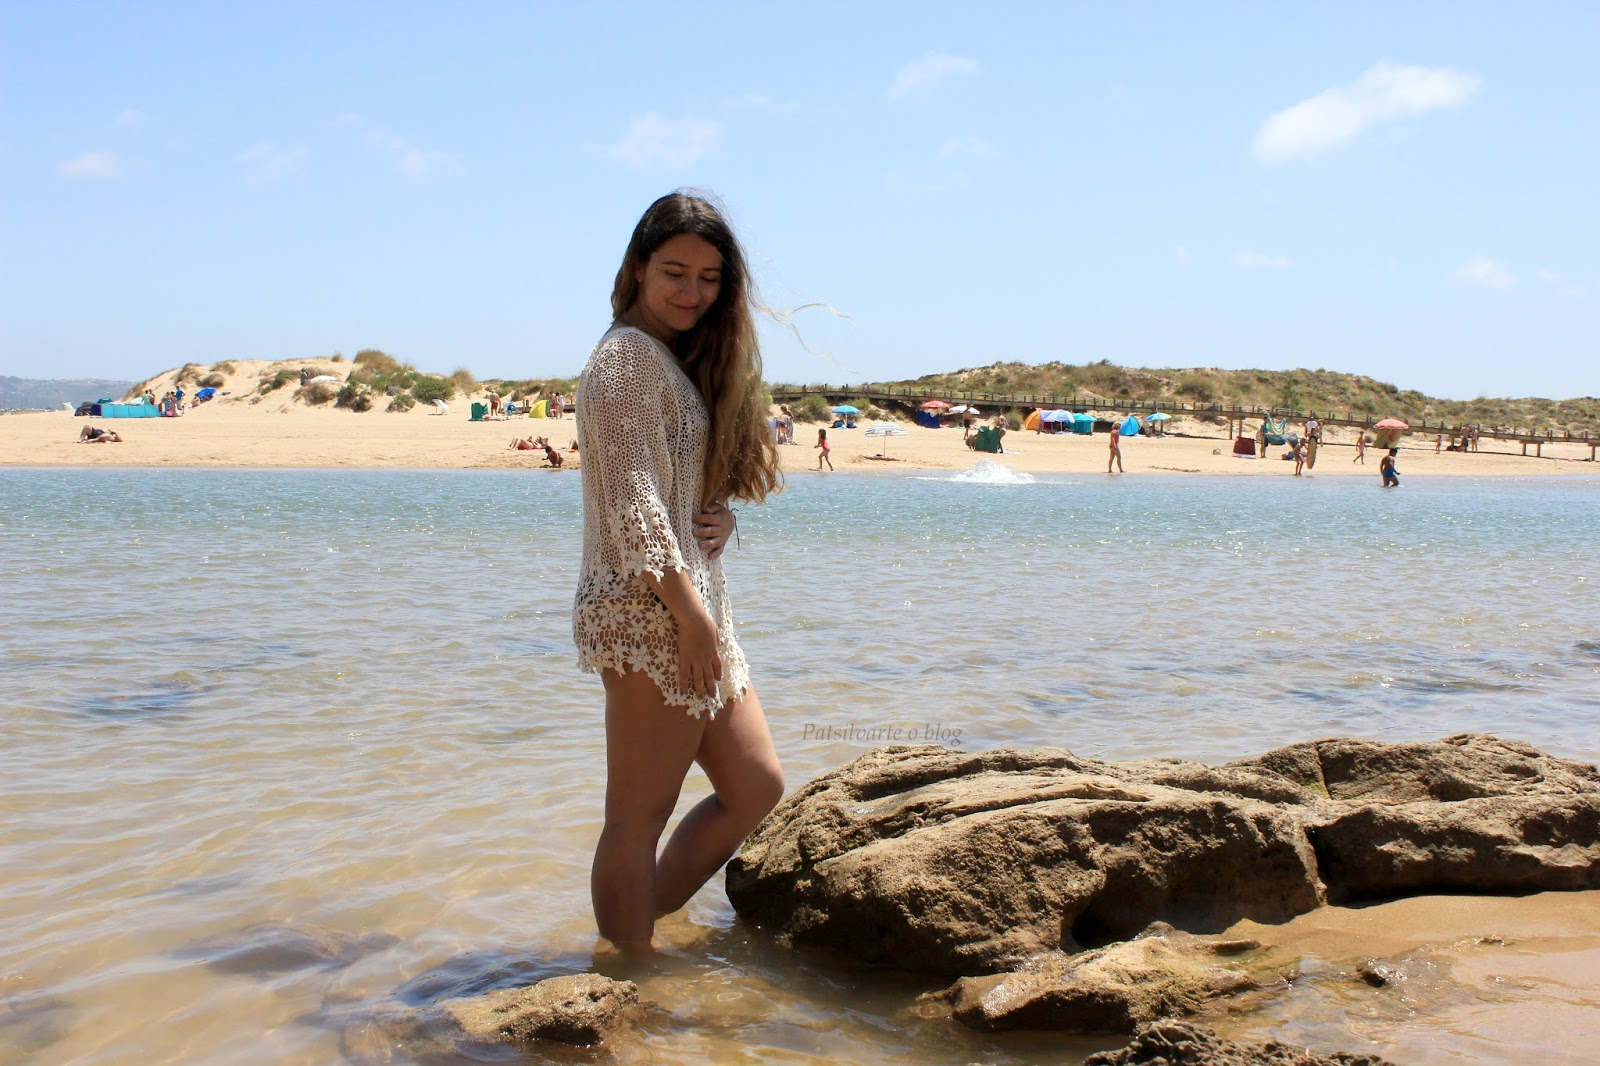 beach day at Salir do Porto